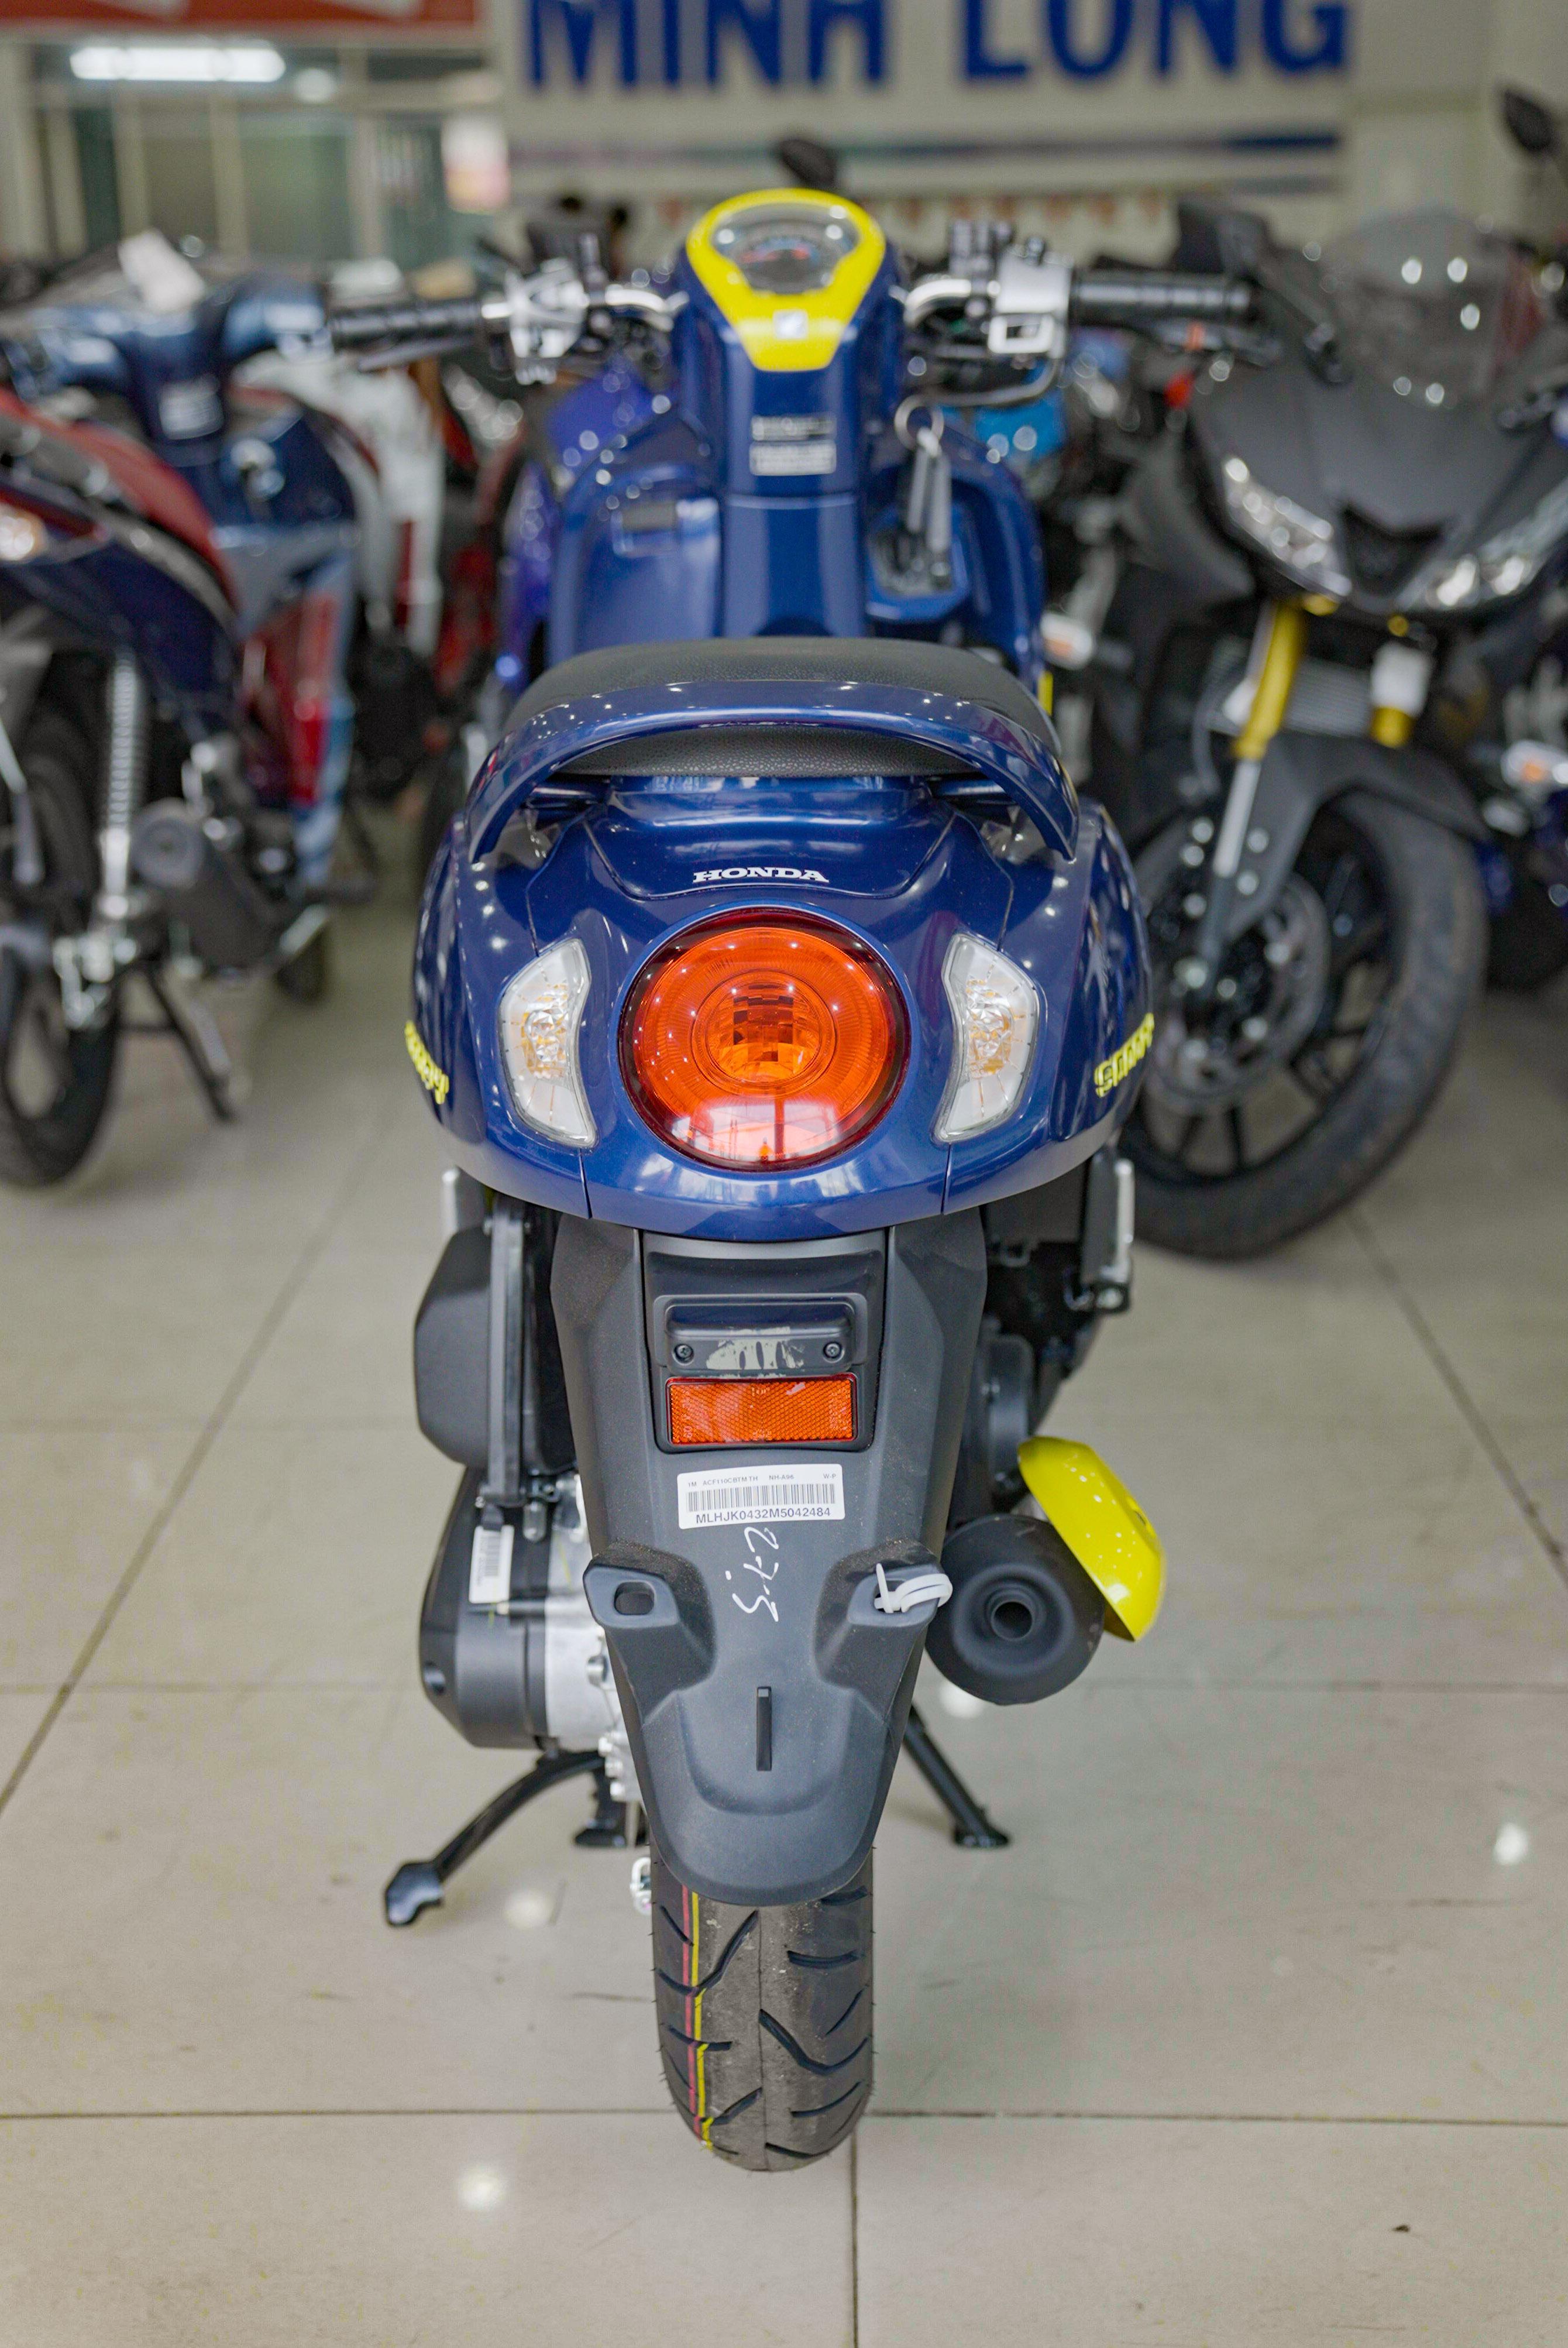 So sanh Honda Scoopy 2021 va Yamaha Janus anh 17